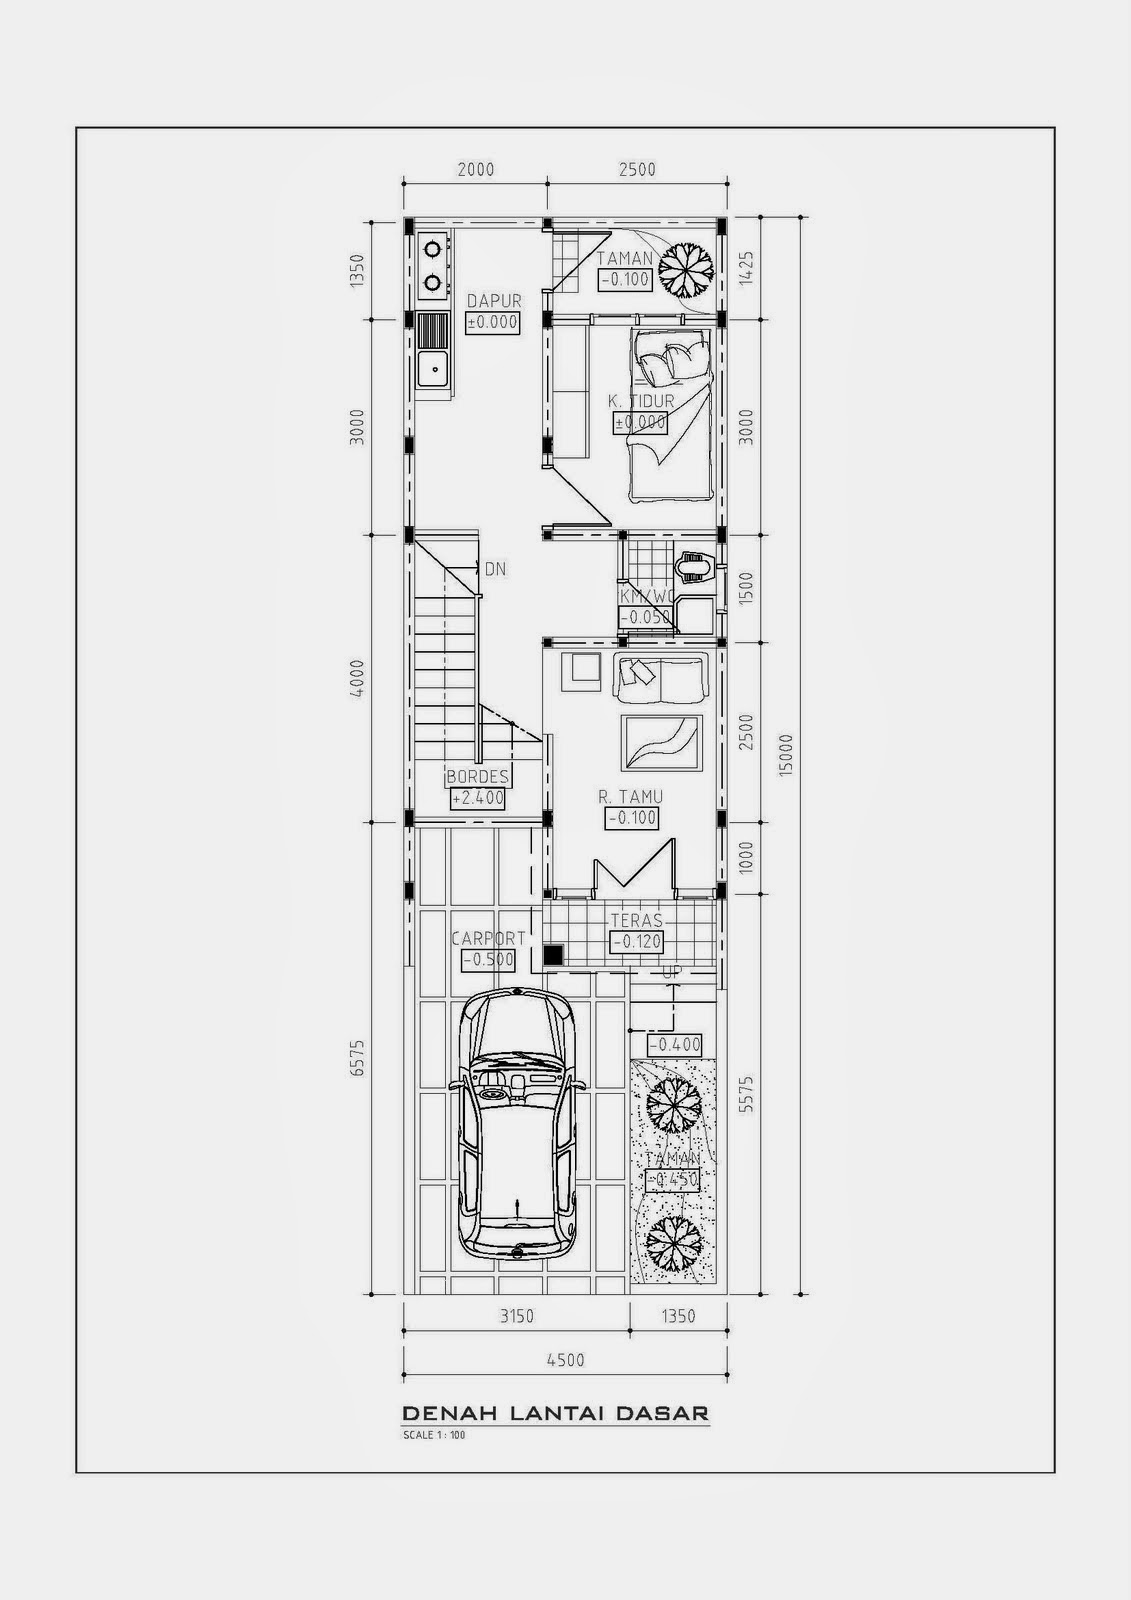 Image Result For Design Interior Rumah Minimalis Modern Lantai